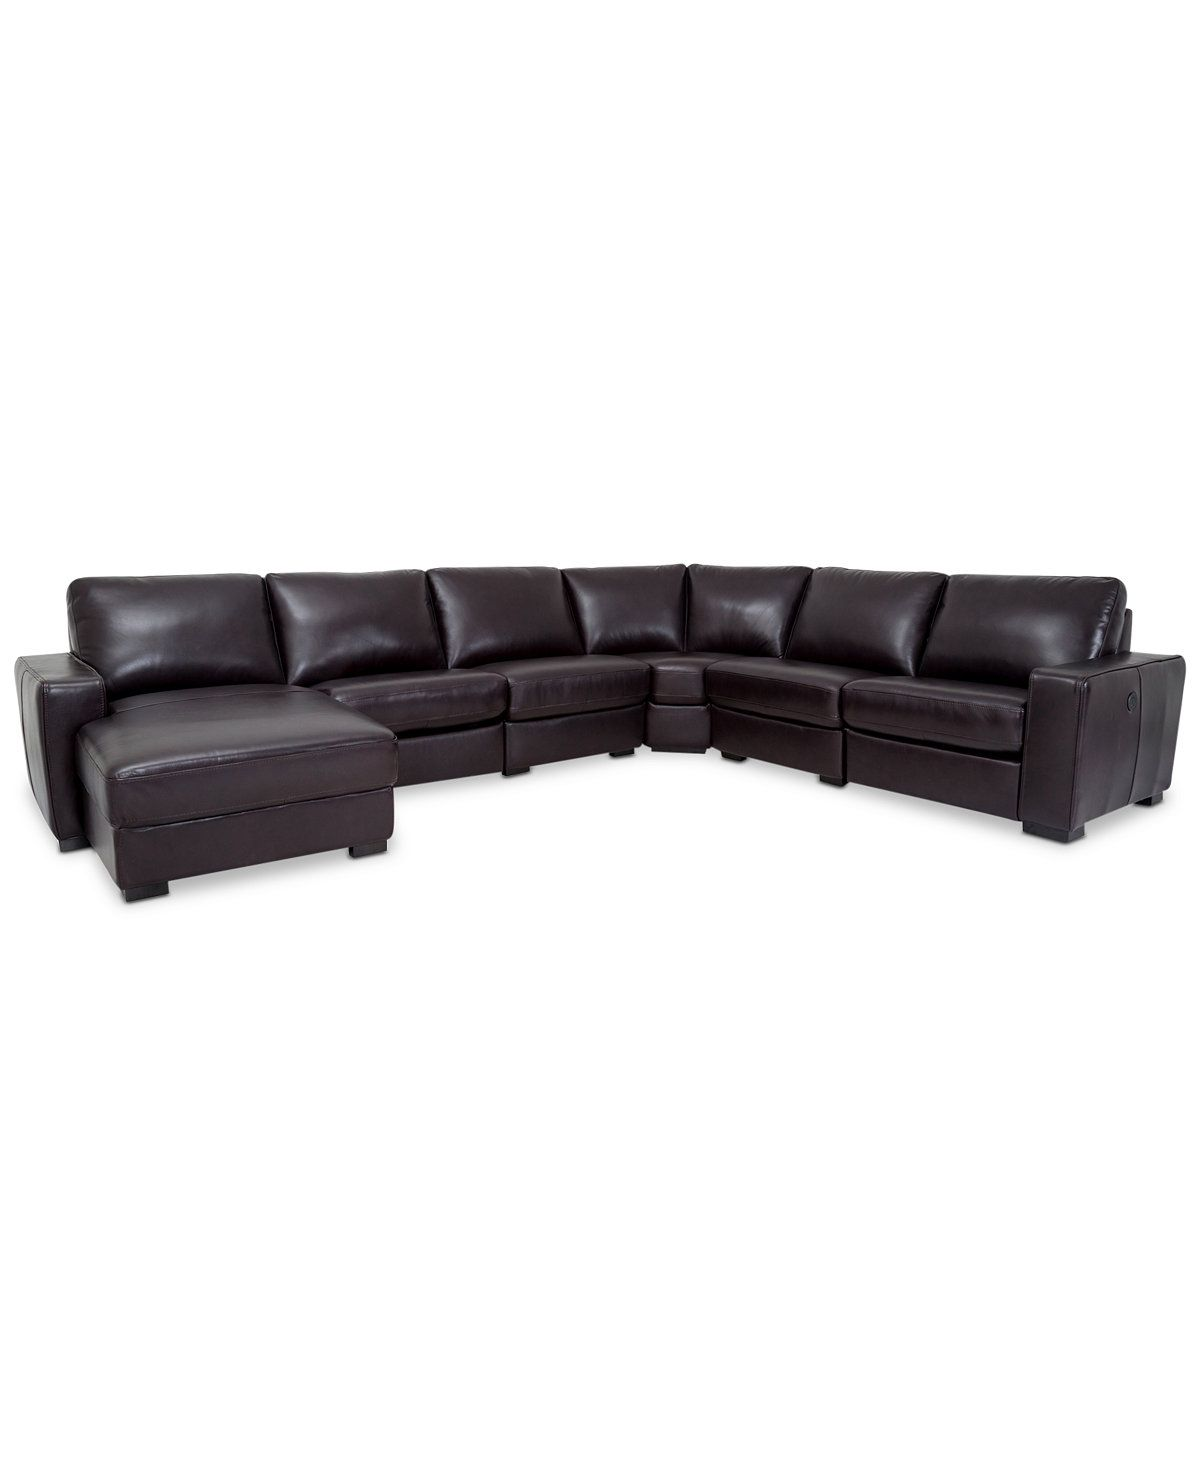 macys leather sofa with chaise cindy crawford sleeper sectional baci living room